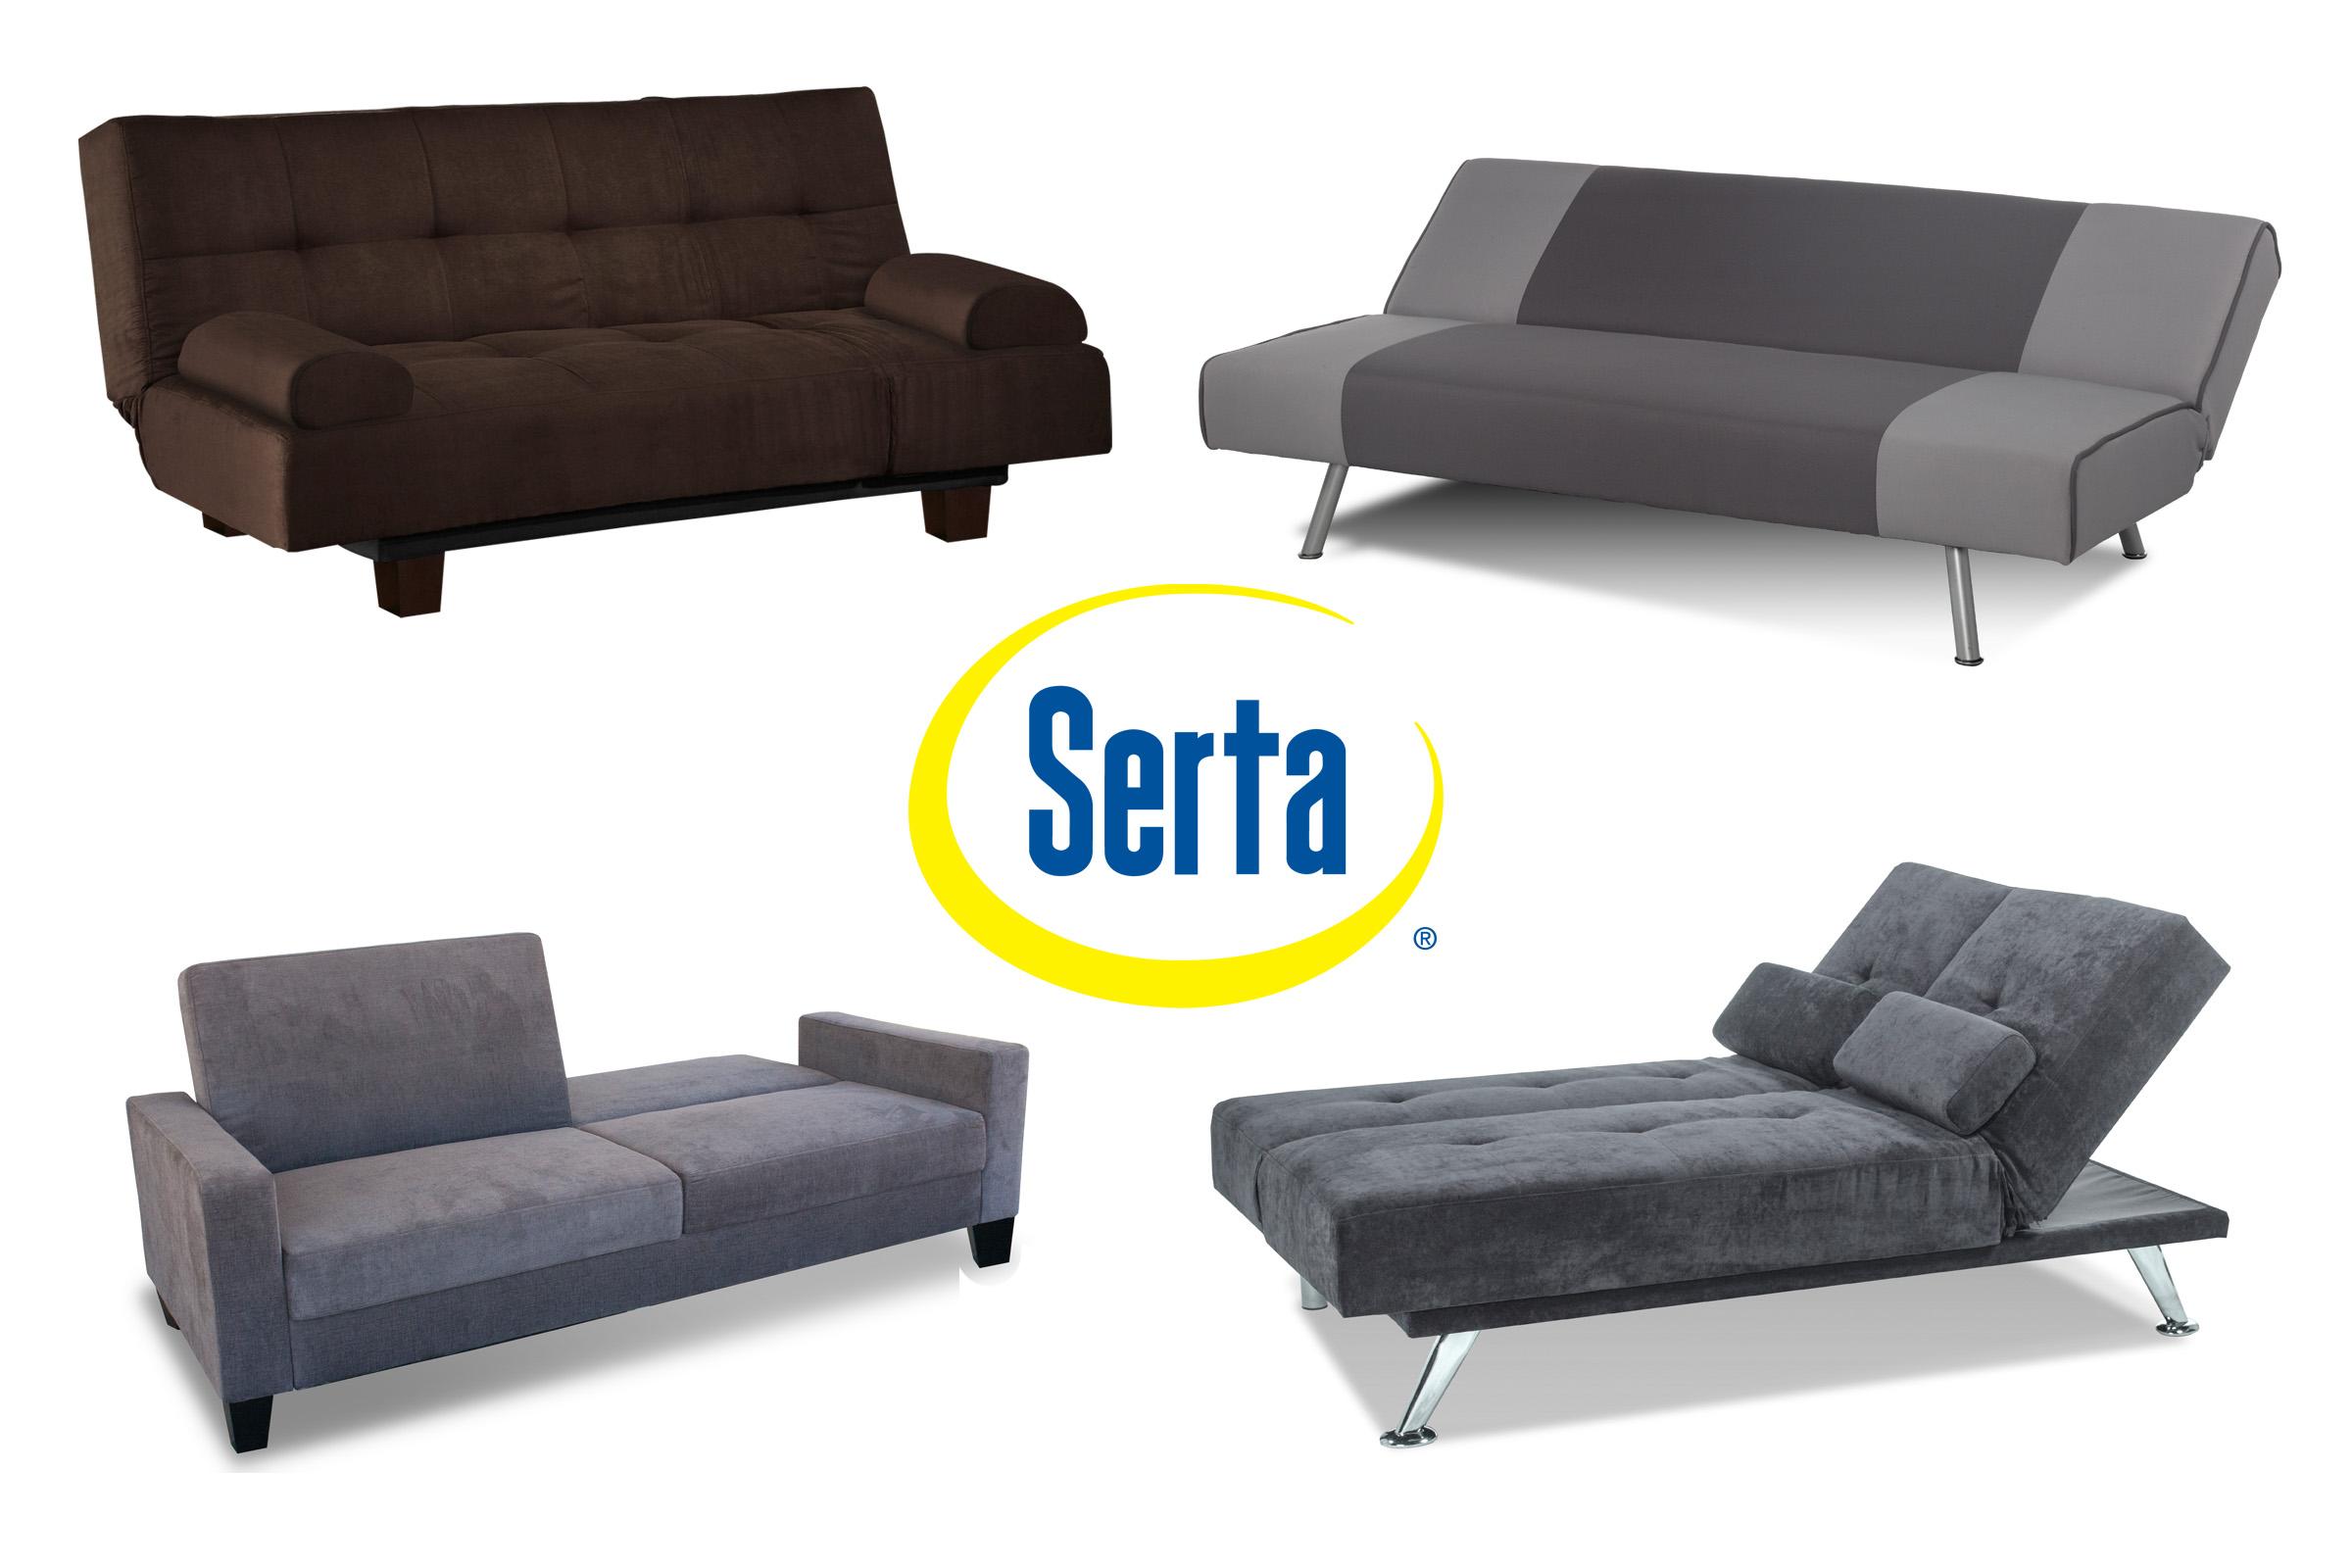 Astonishing Serta Dream Convertible Klik Klak Futons Collection Bralicious Painted Fabric Chair Ideas Braliciousco